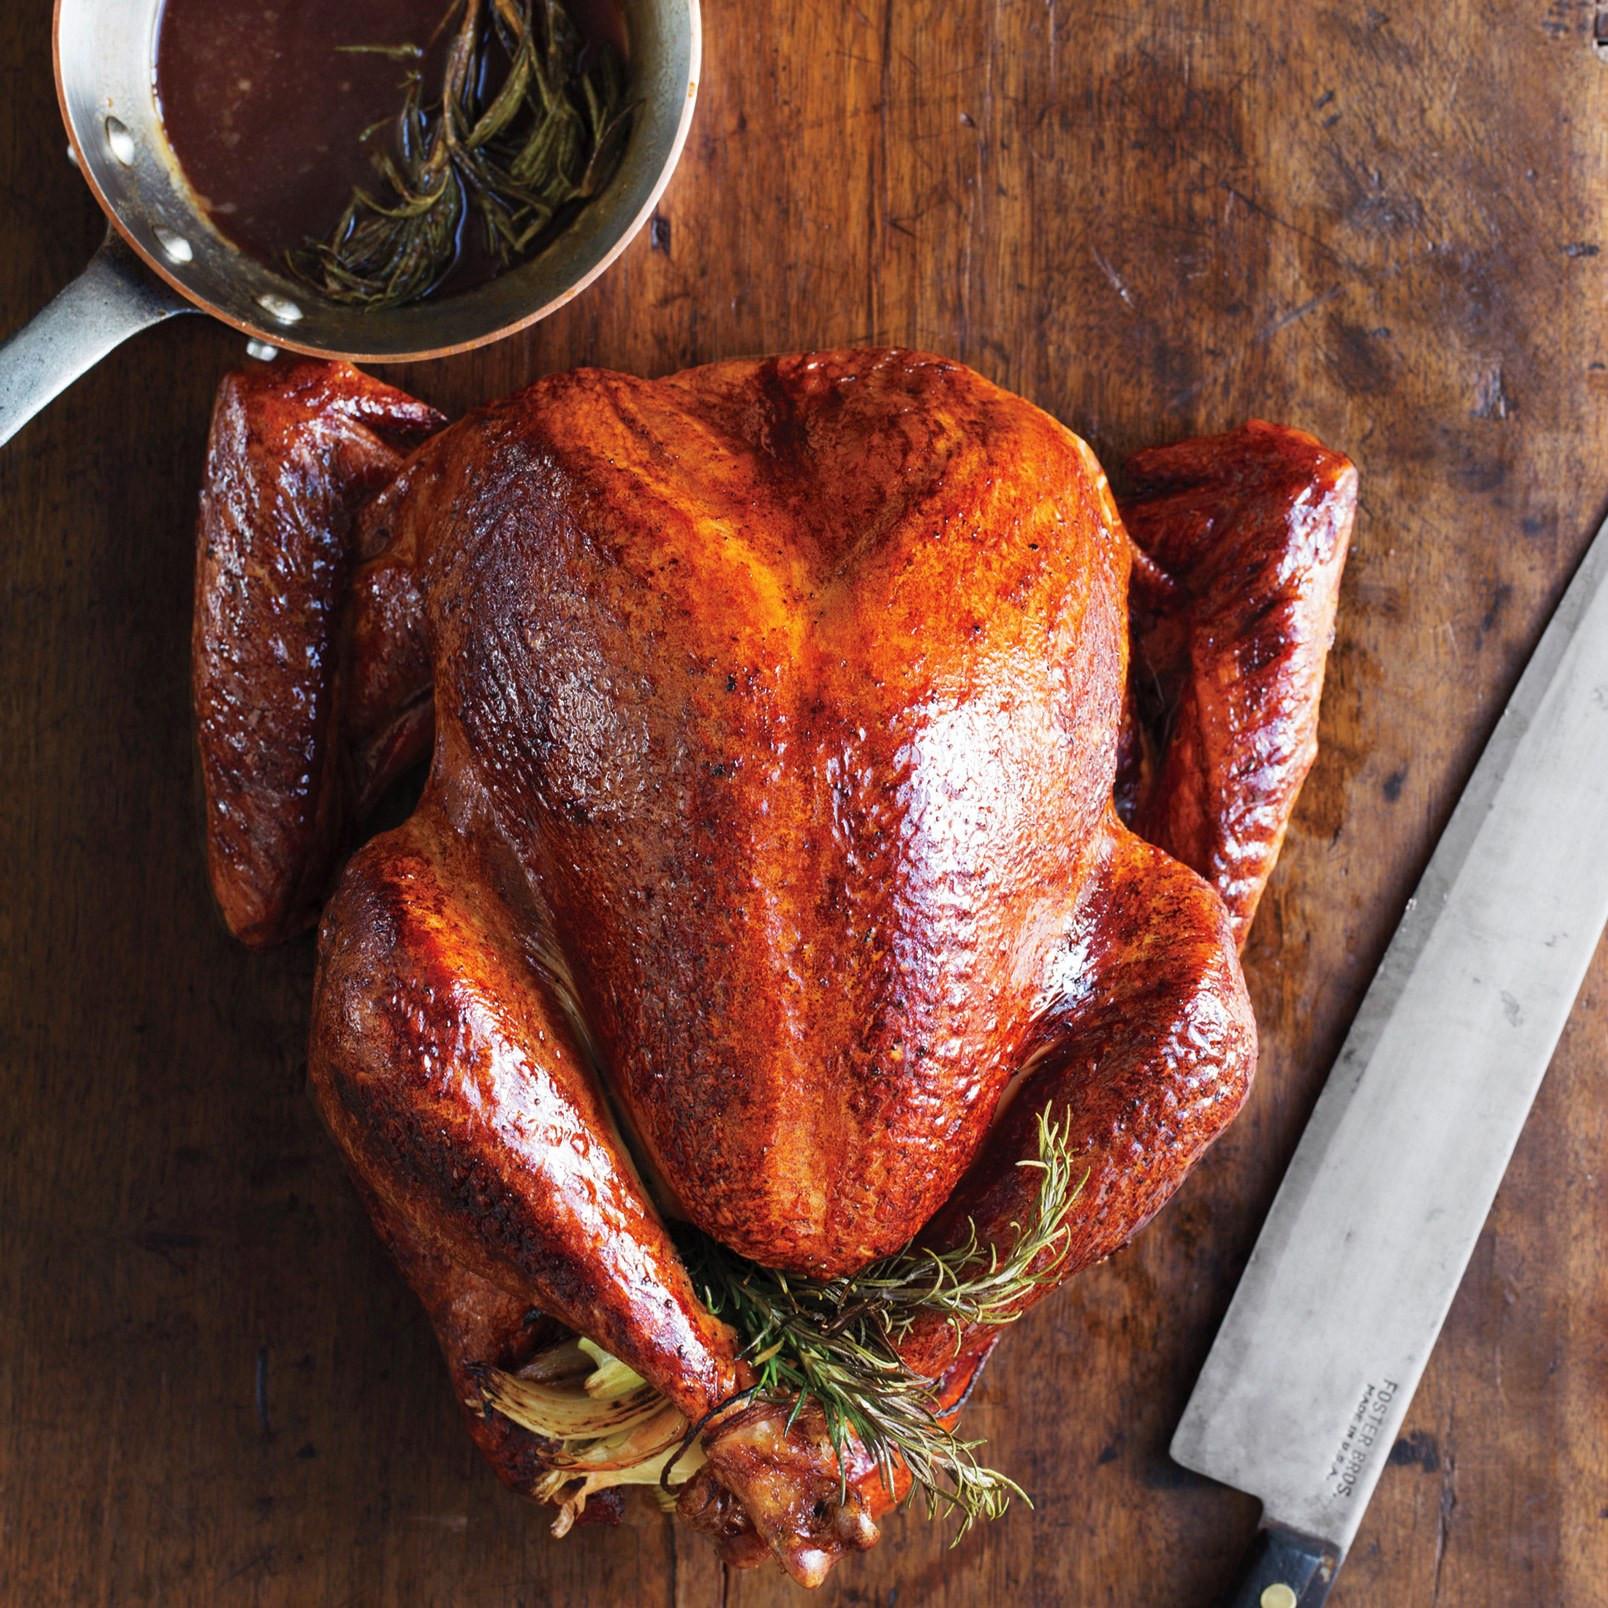 Roasted Thanksgiving Turkey  A Simple Roast Turkey recipe